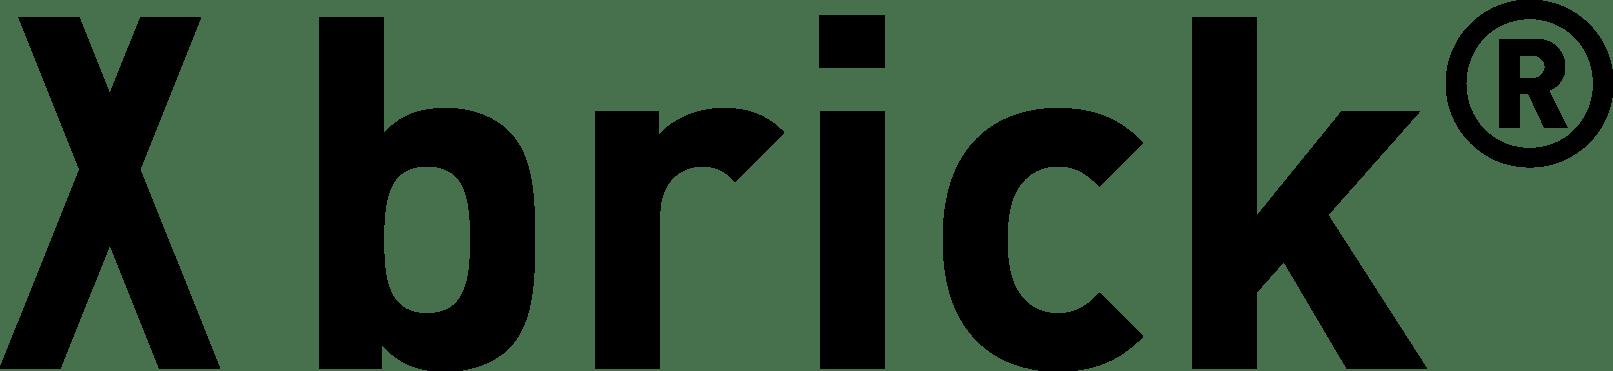 Logo Xbrick®